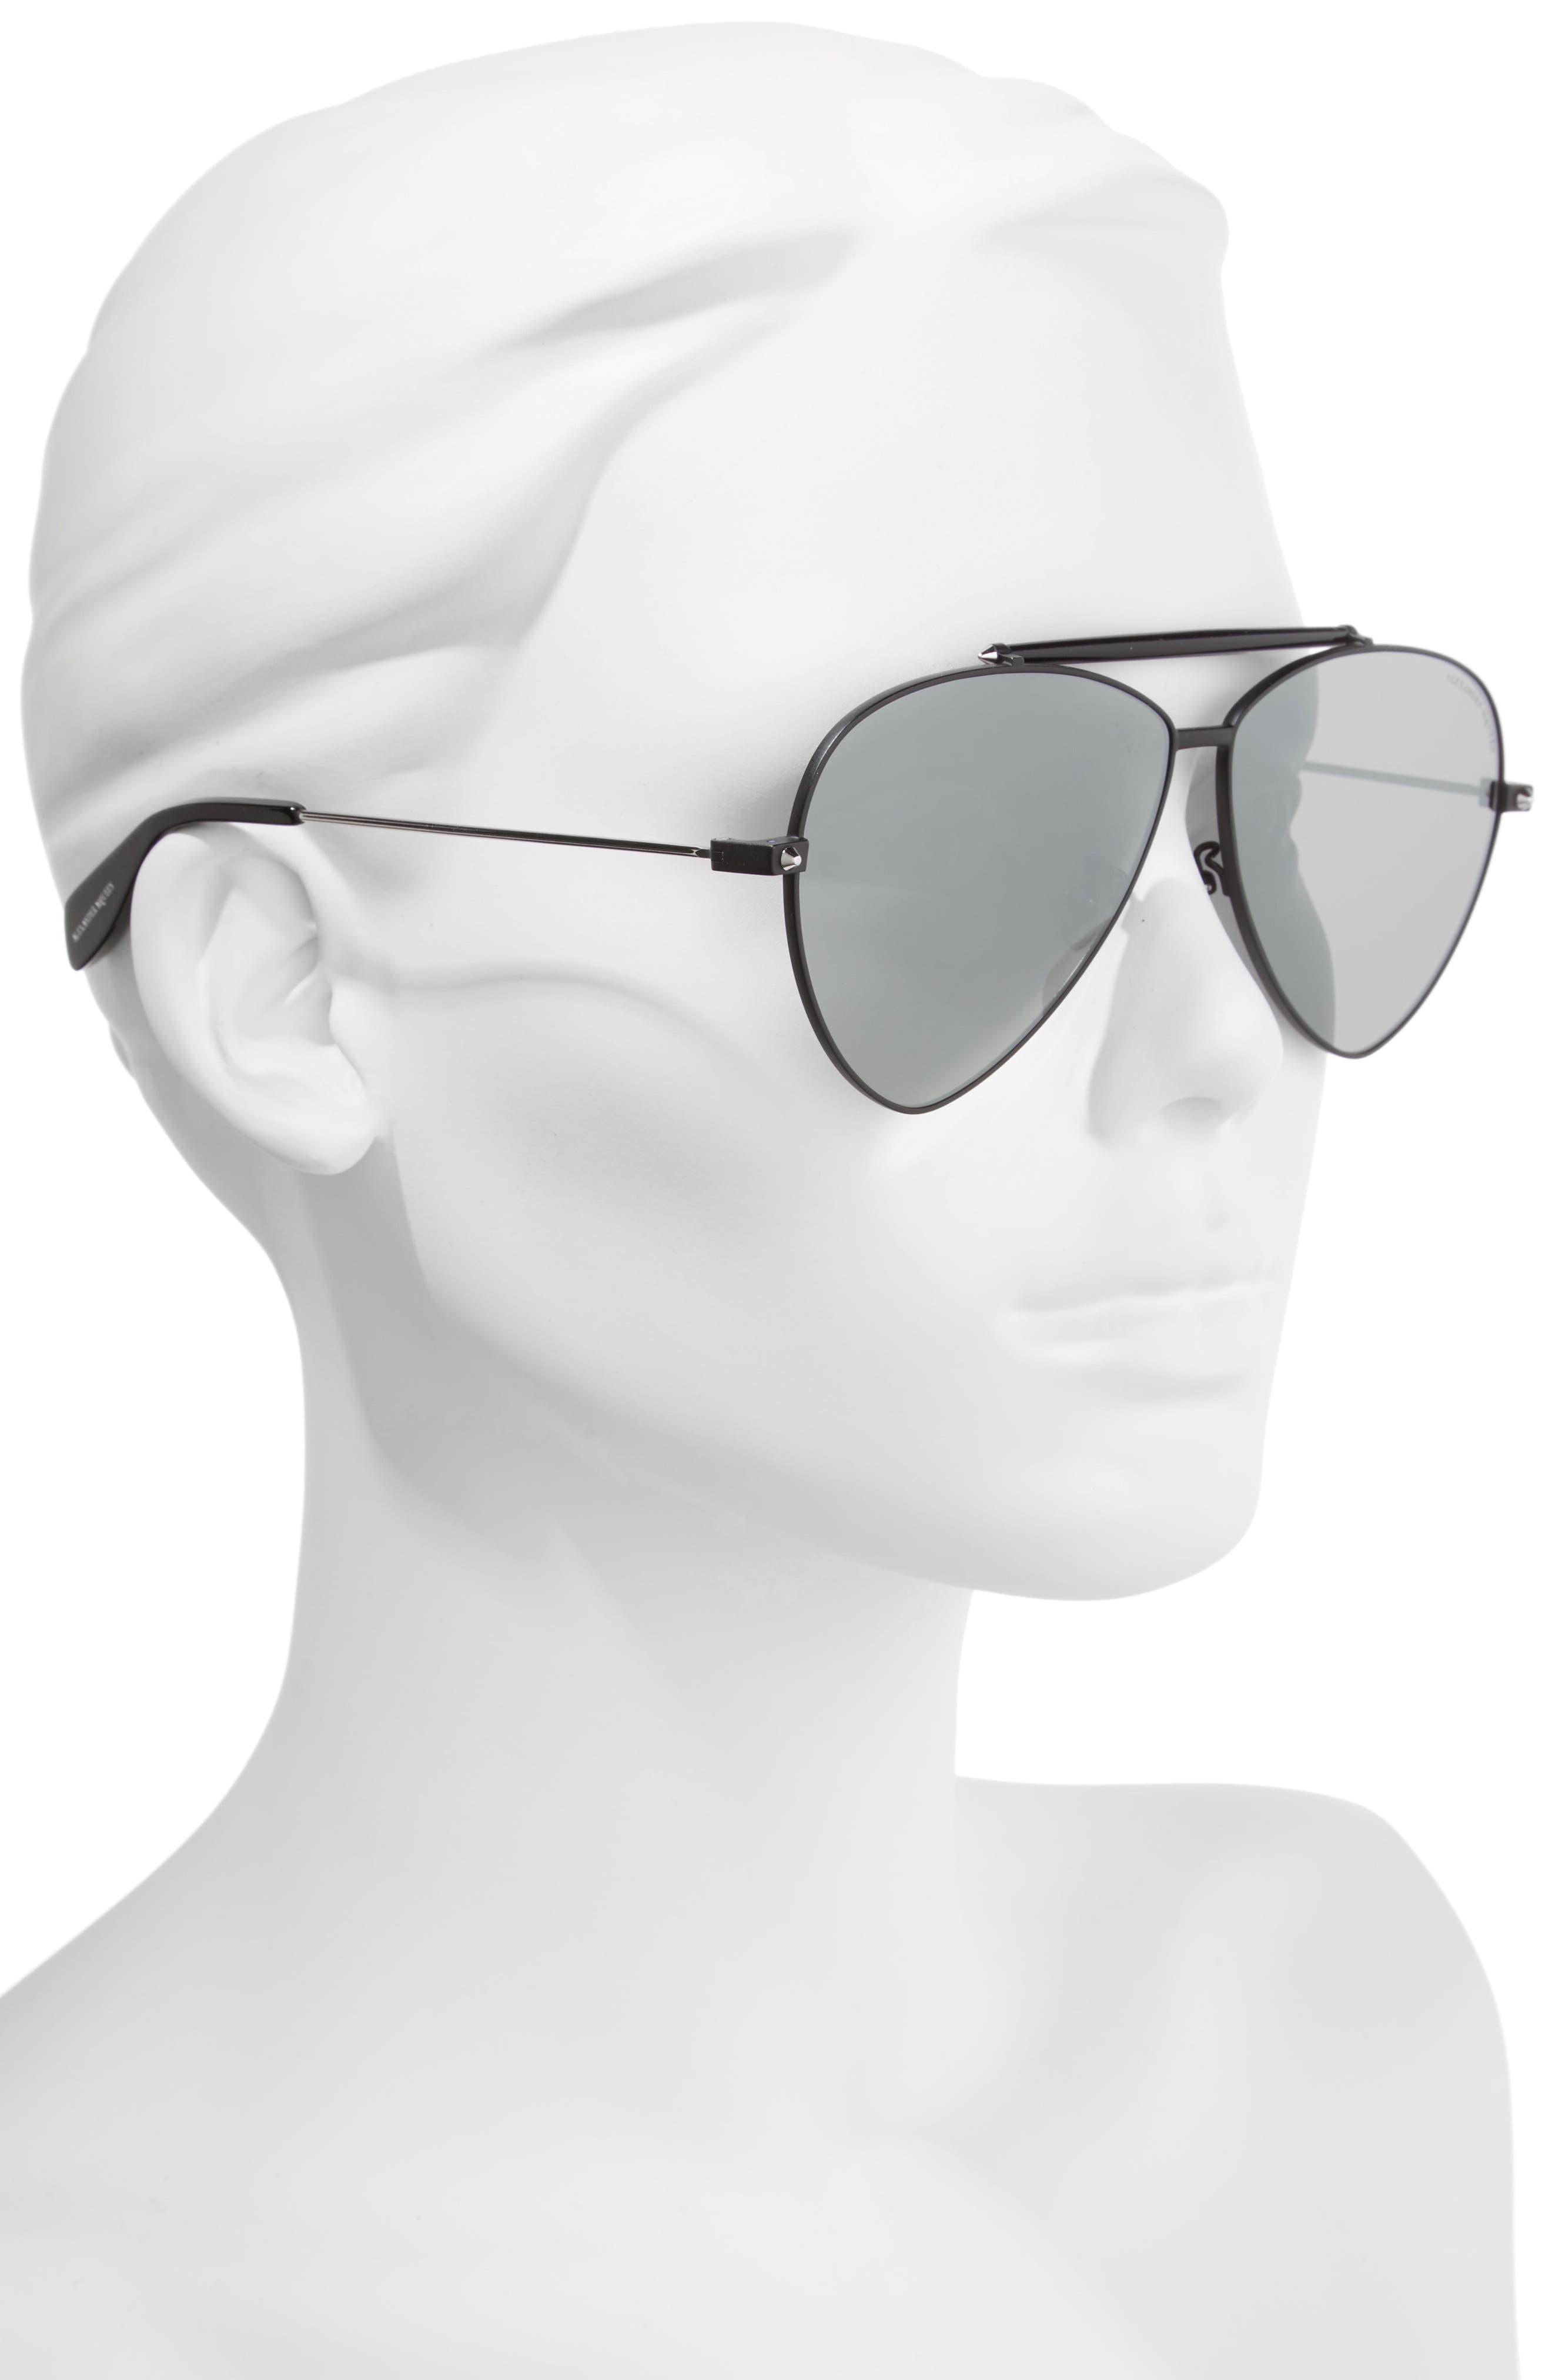 63mm Oversize Aviator Sunglasses,                             Alternate thumbnail 2, color,                             Black